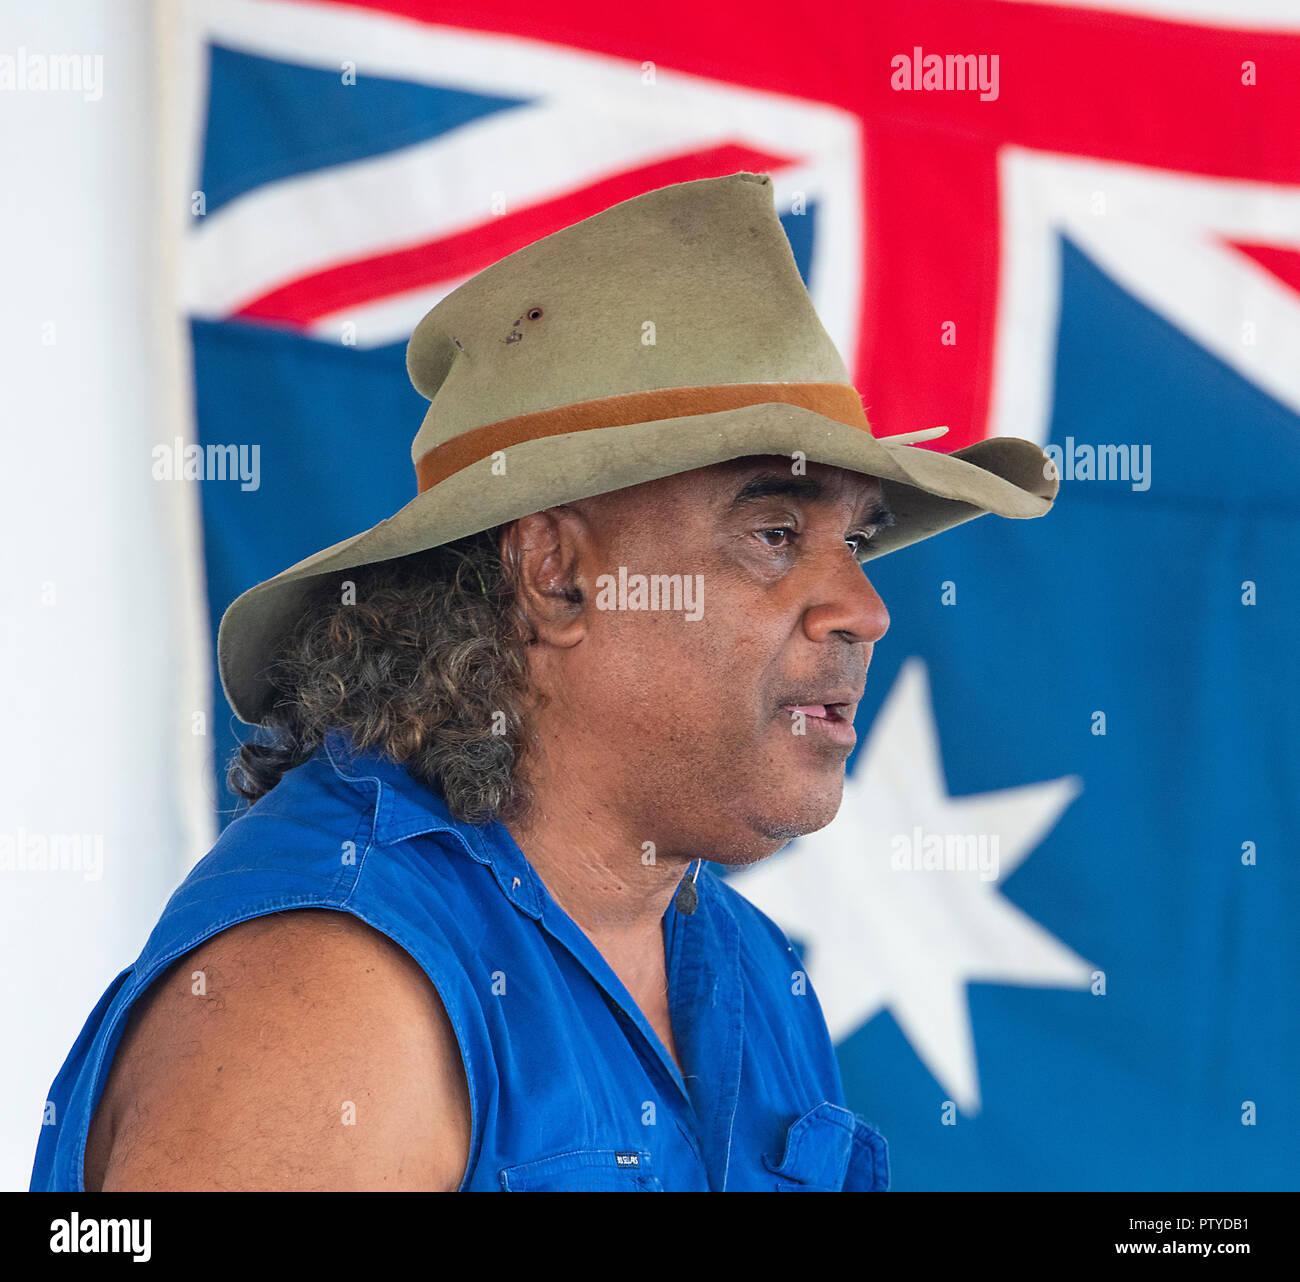 portrait-of-david-hudson-an-aboriginal-m